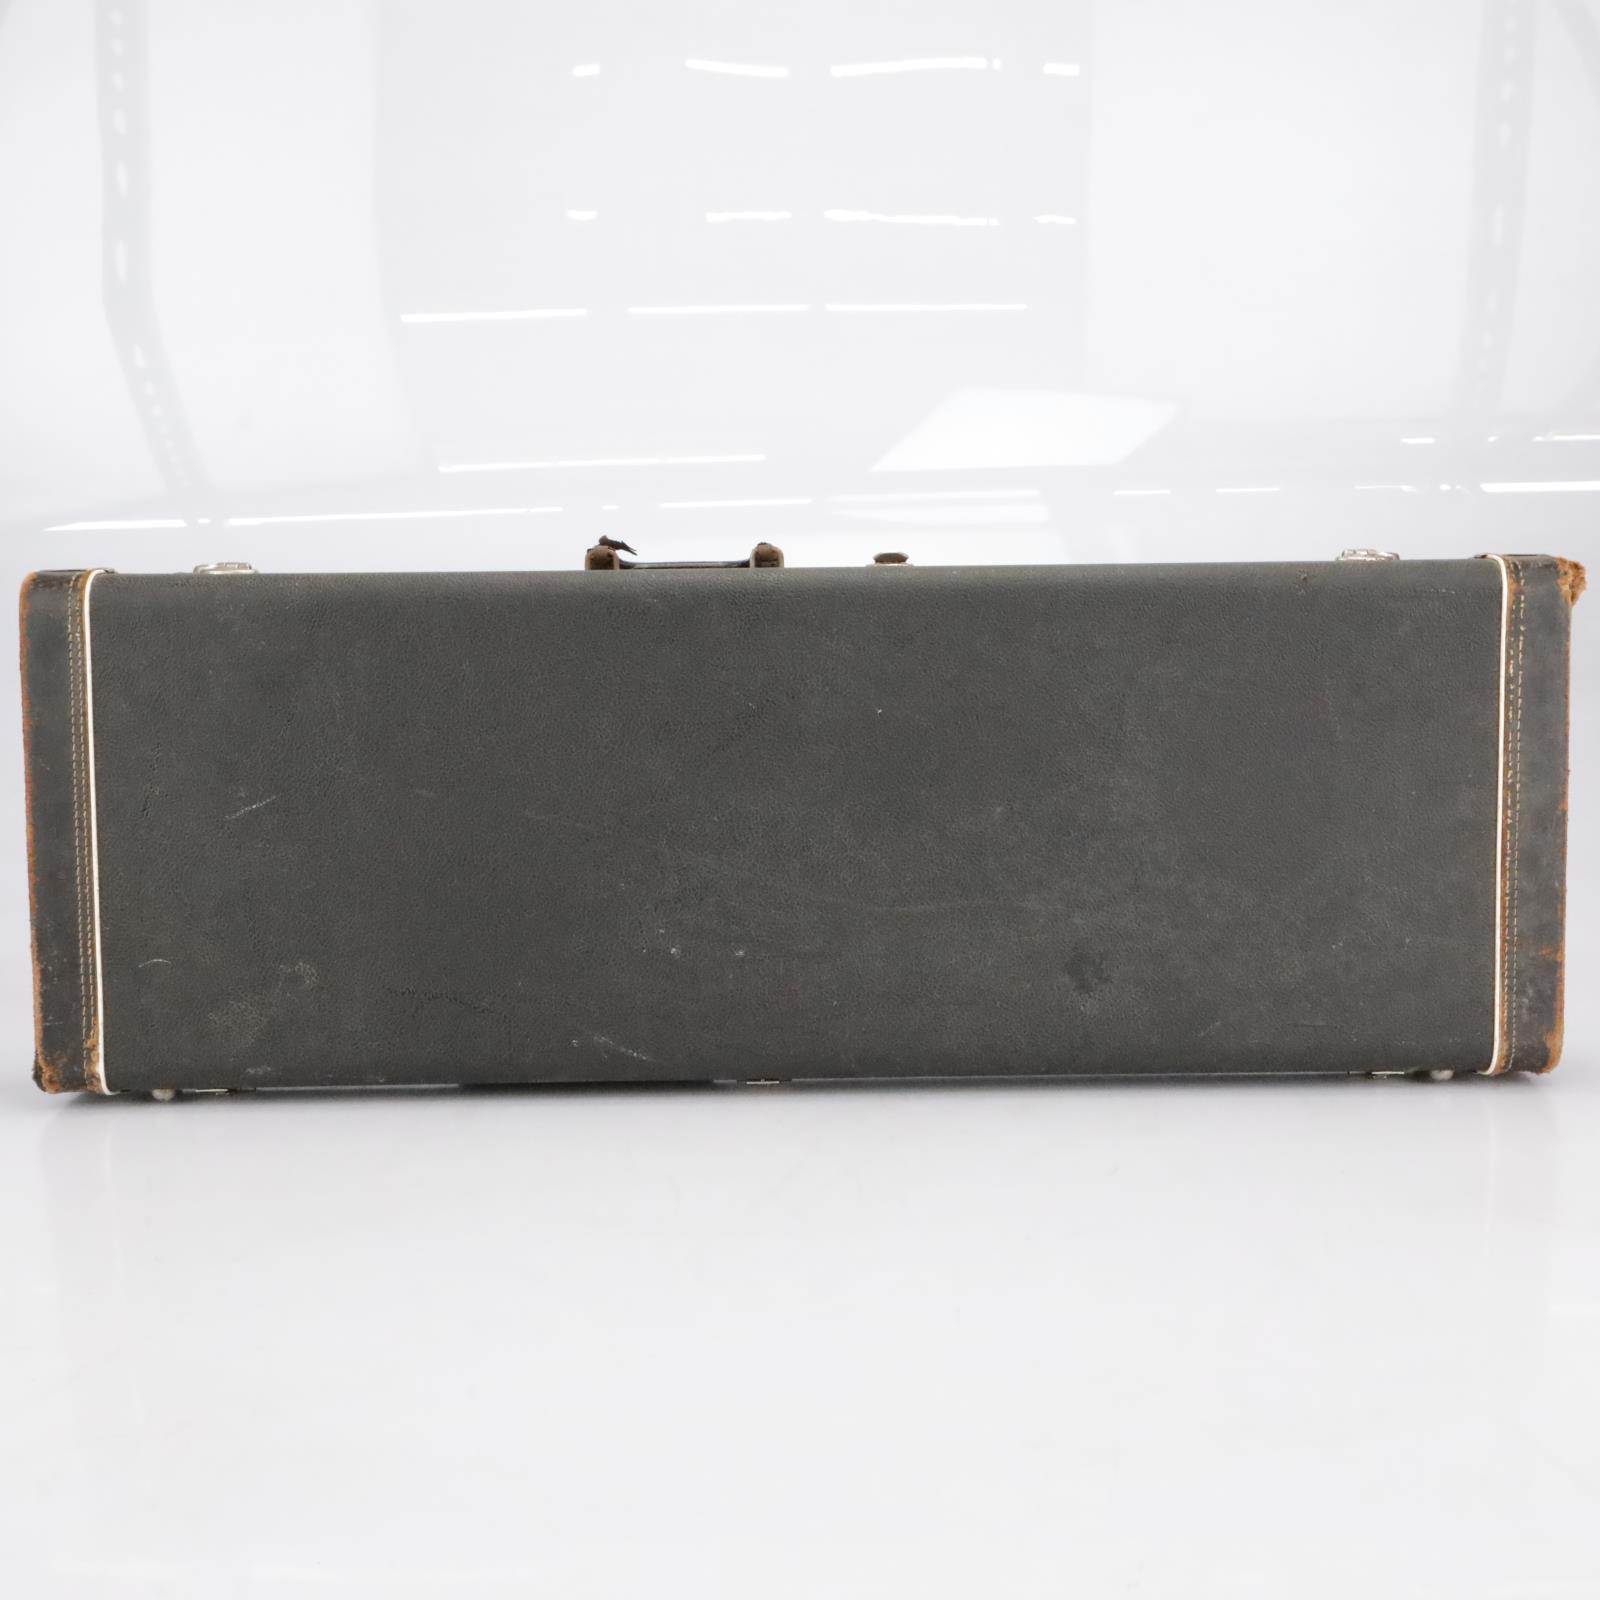 Vintage 1964 Fender Stratocaster / Telecaster Hardshell Guitar Case #41569